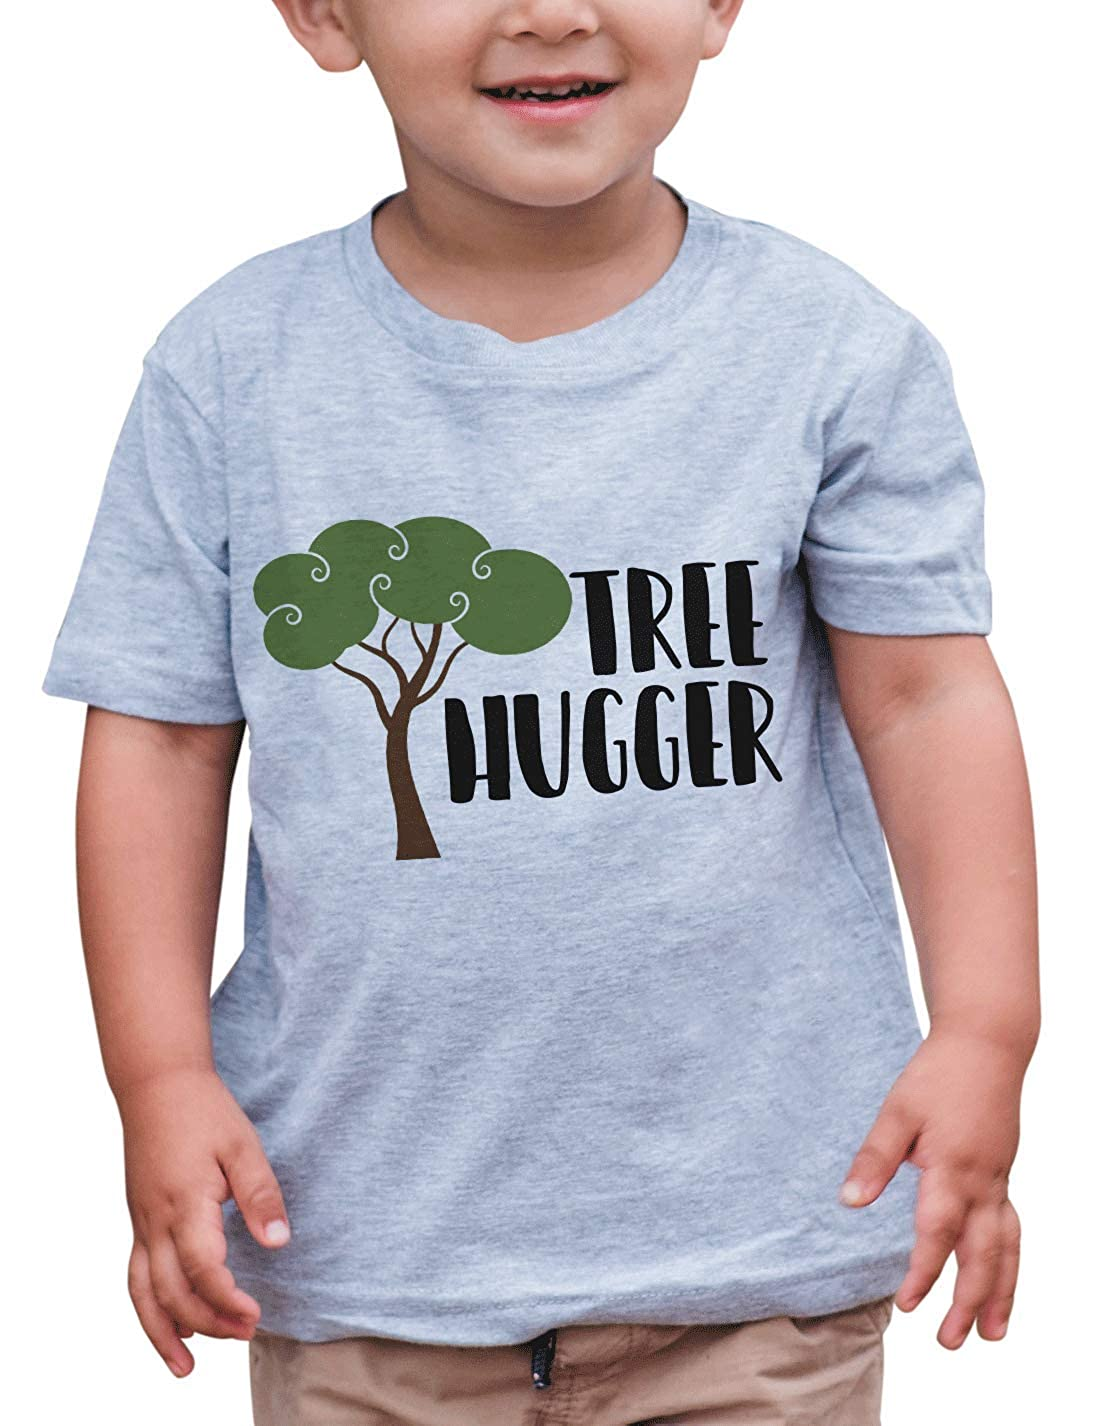 7 ate 9 Apparel Kids Tree Hugger Outdoors T-Shirt